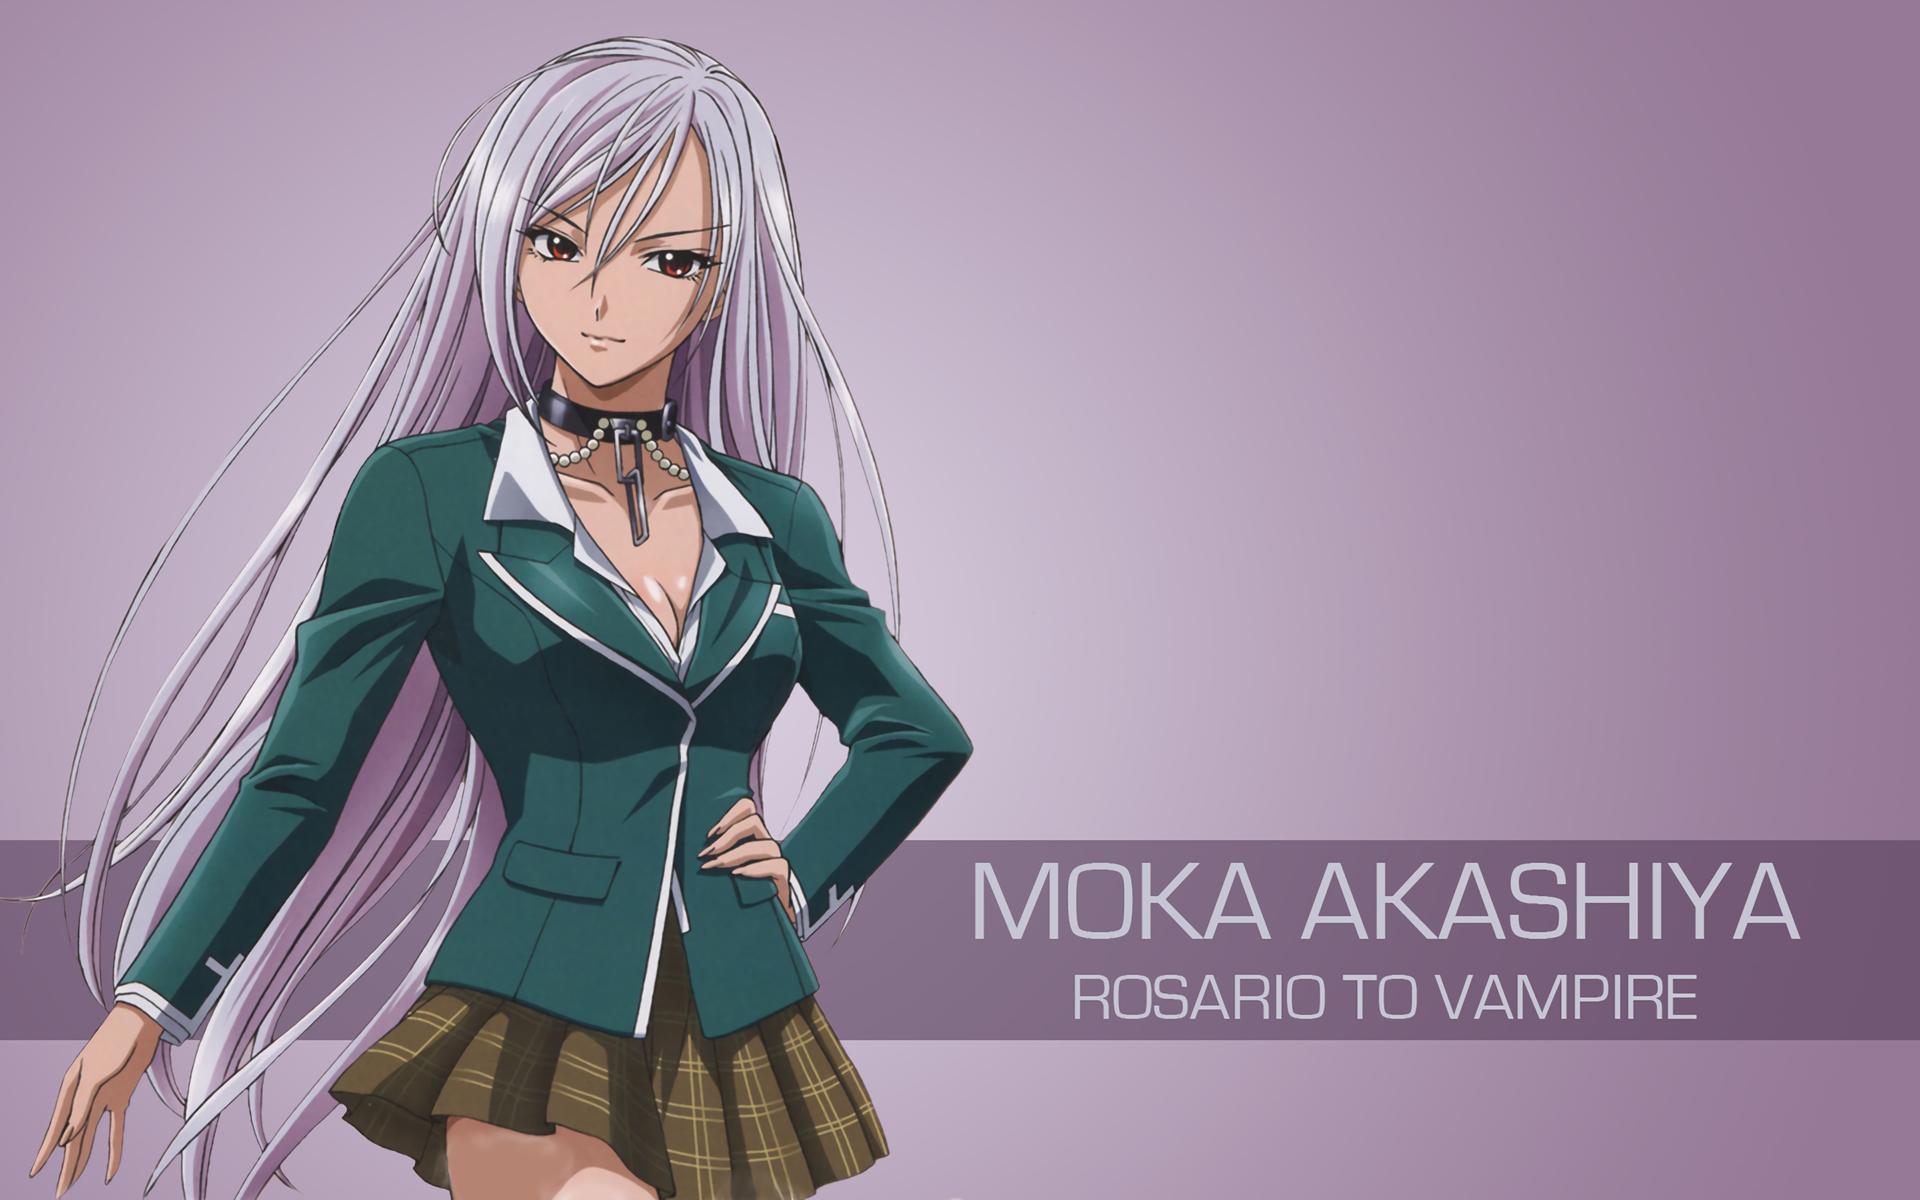 Wallpaper Illustration Anime Girls Rosario Vampire Akashiya